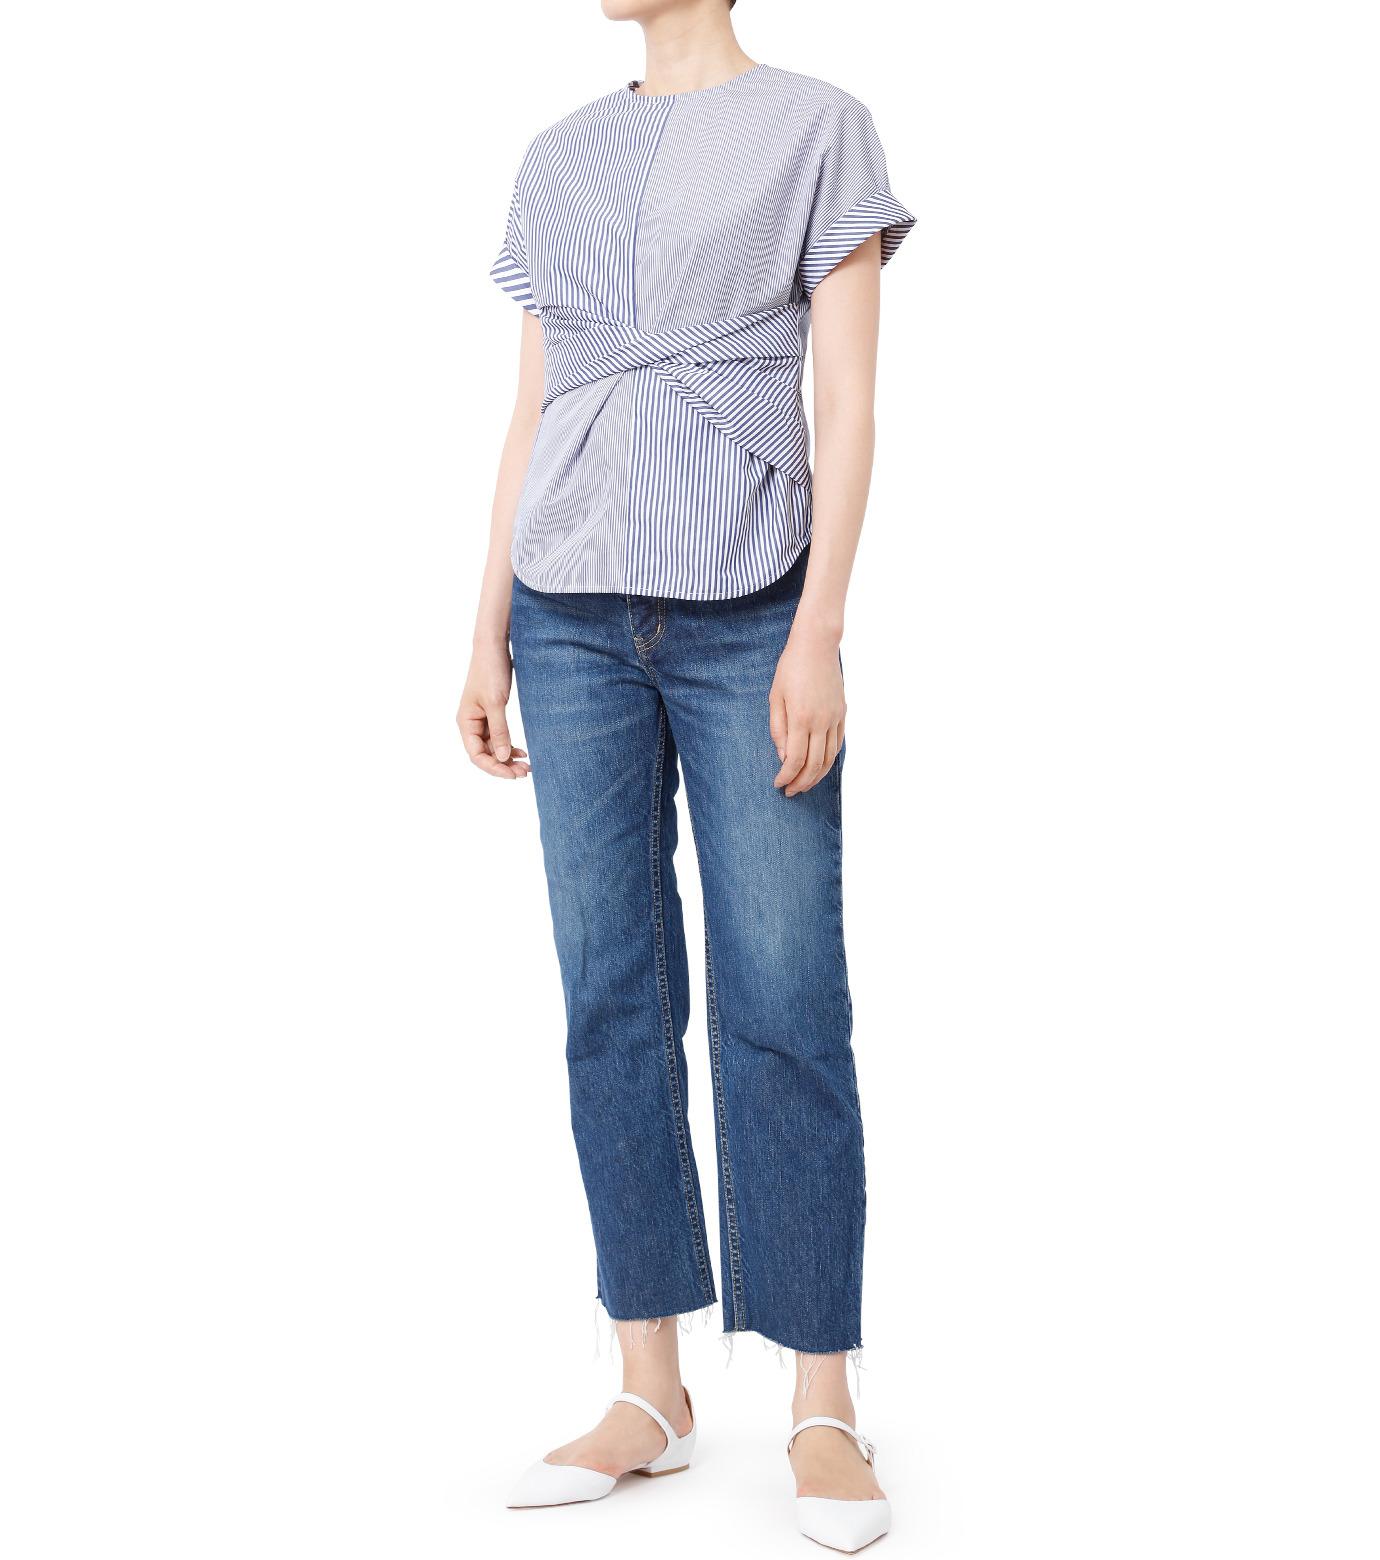 LE CIEL BLEU(ルシェルブルー)のストライプツイストトップス-MULTI COLOUR(シャツ/shirt)-18A63313 拡大詳細画像3